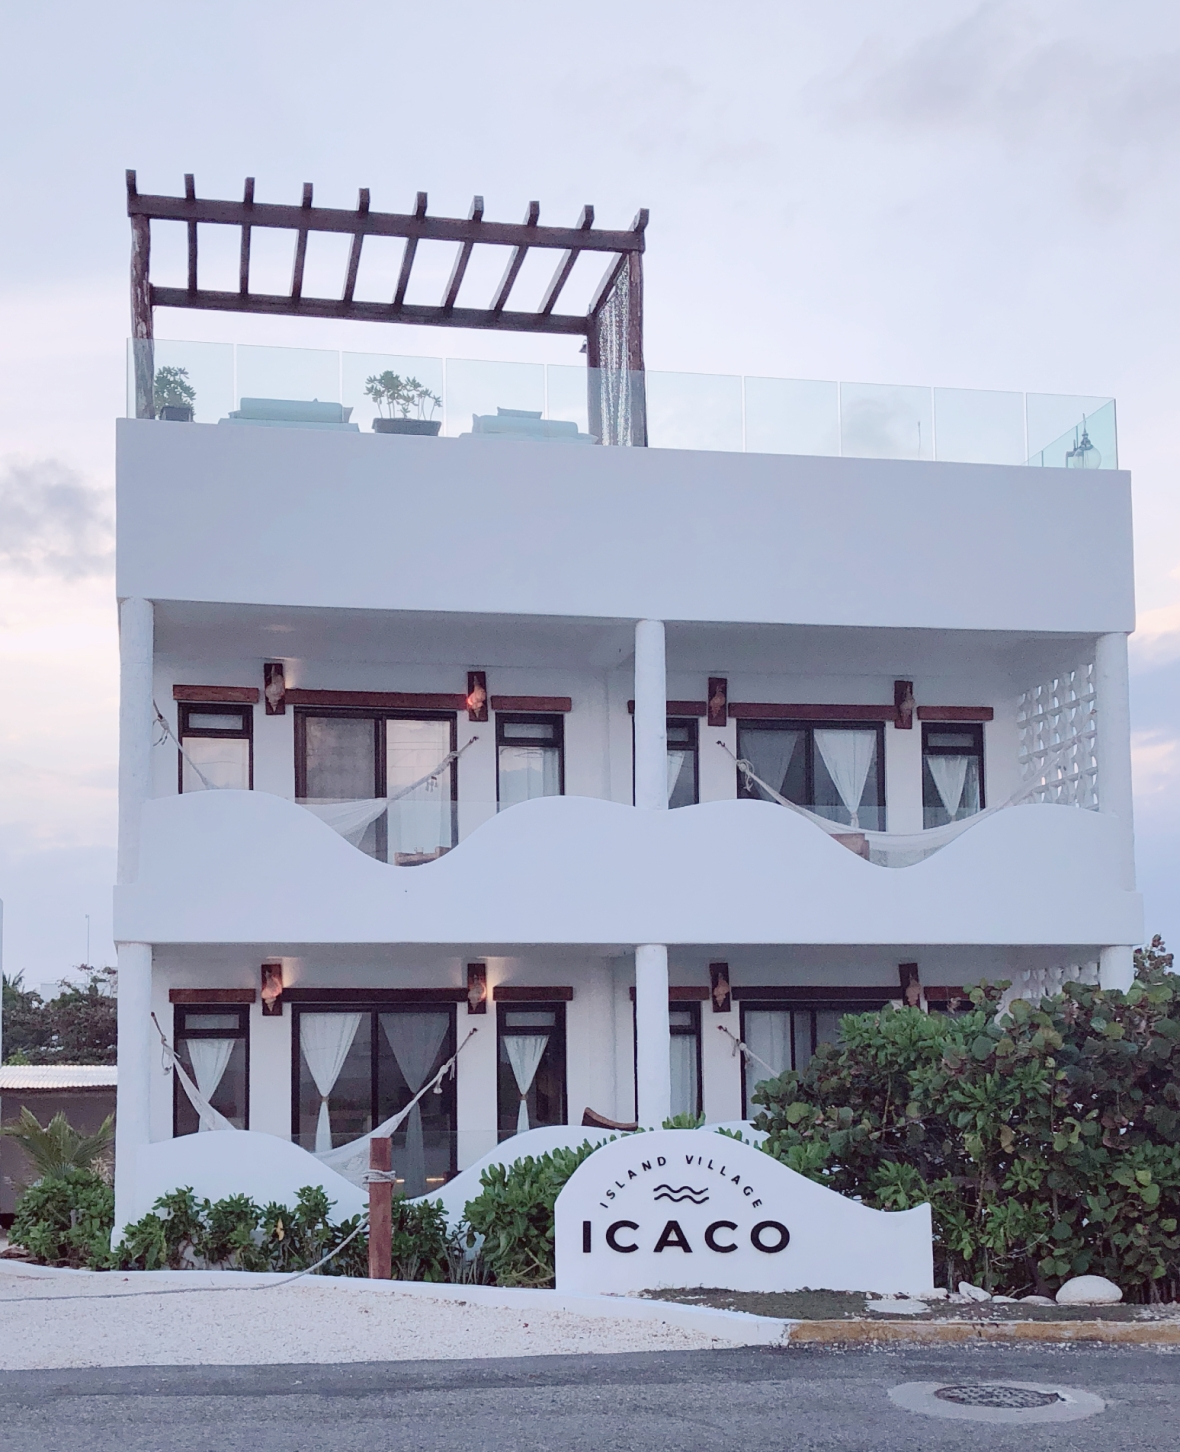 Icaco part 2